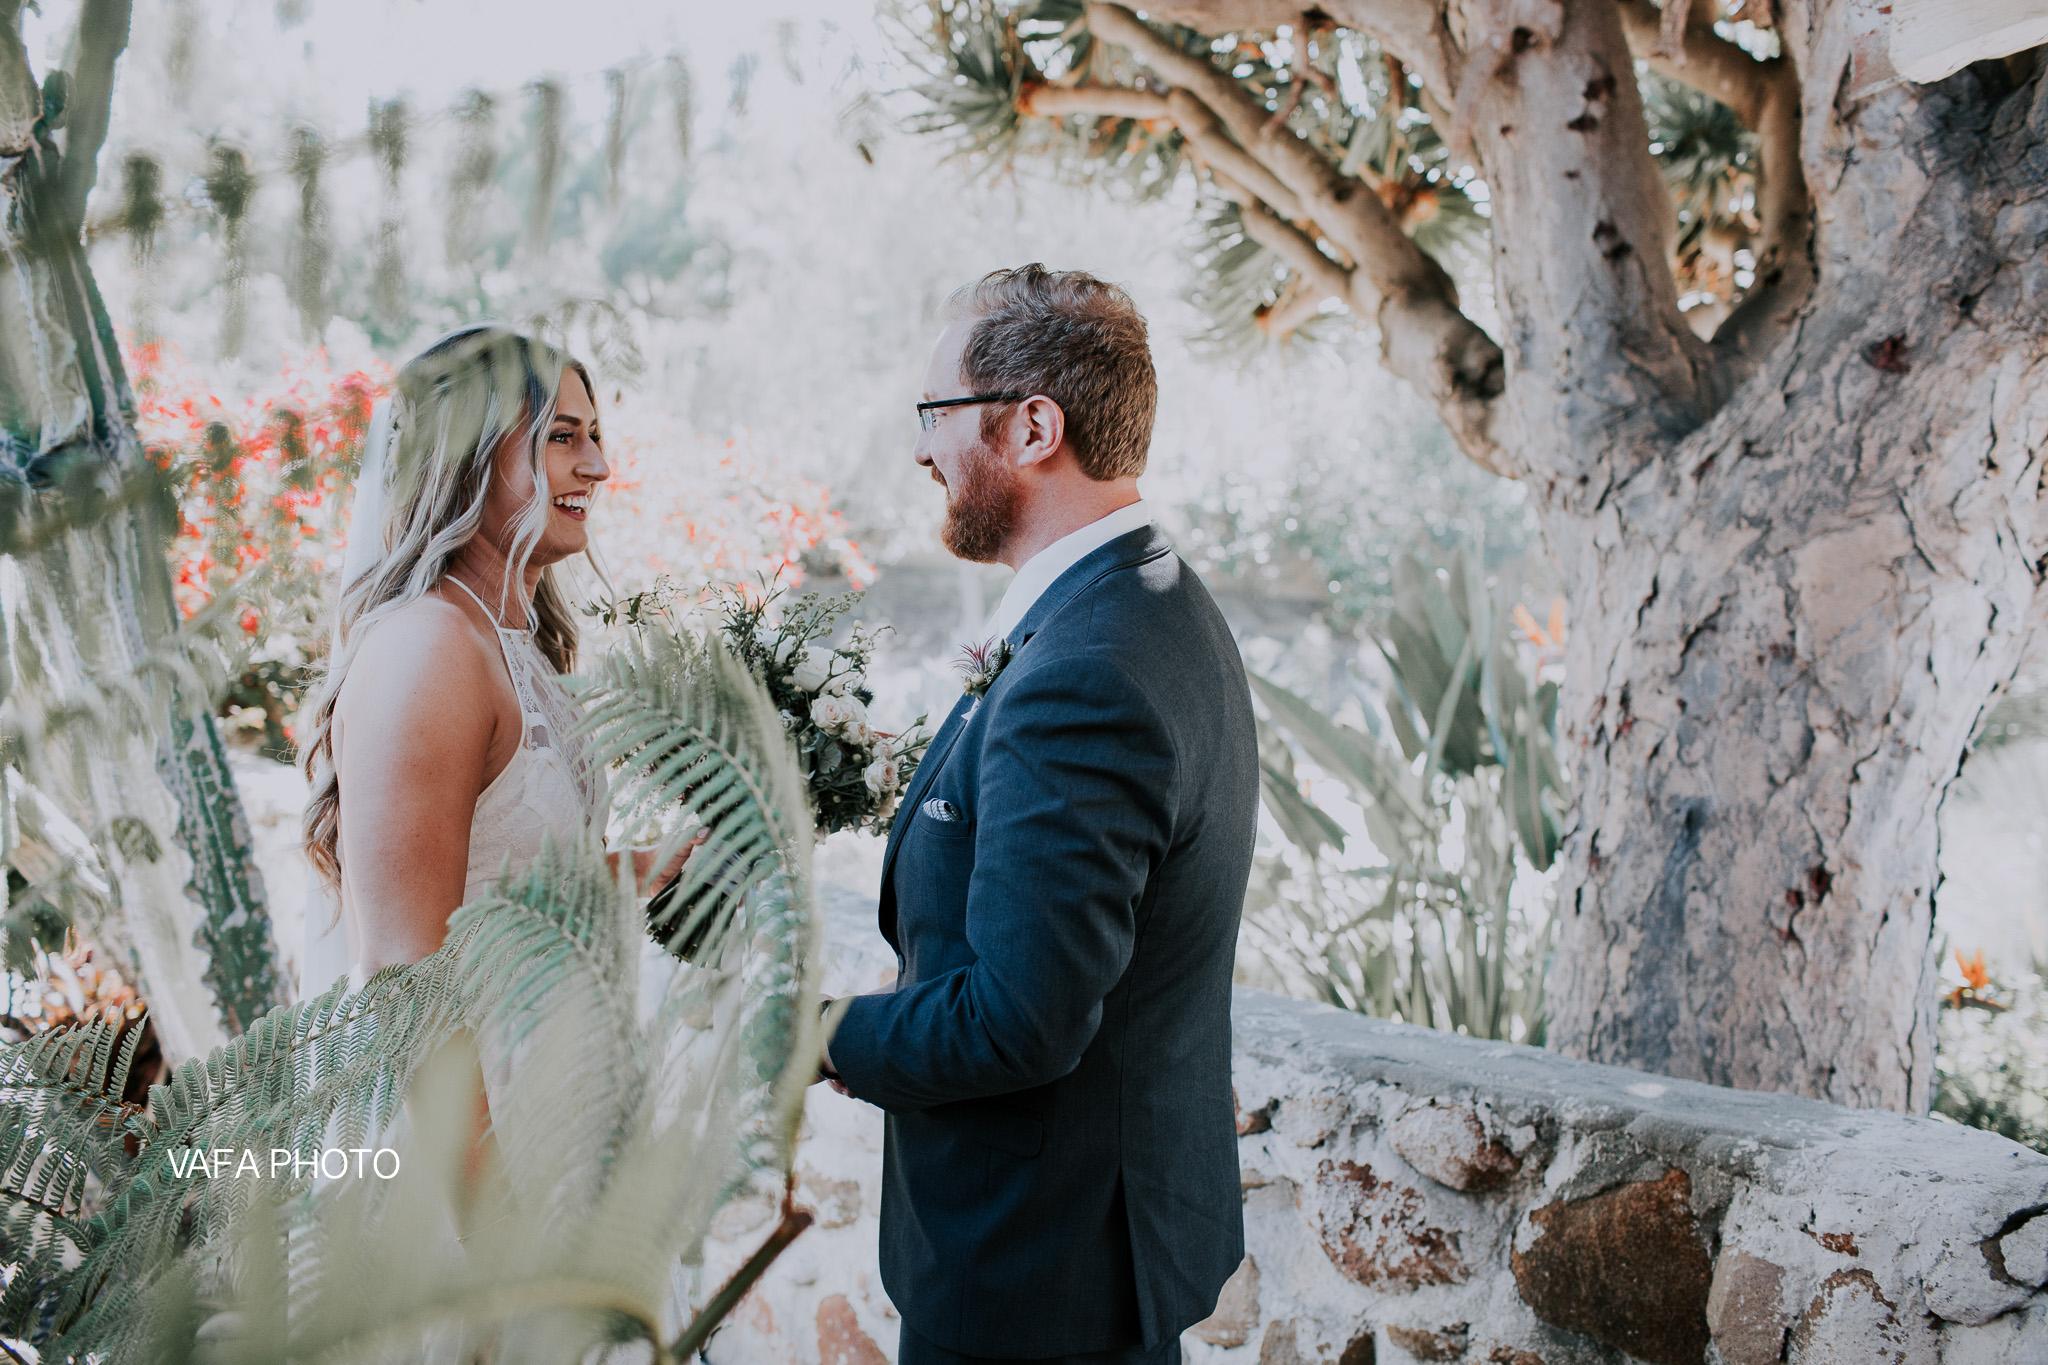 Leo-Carrillo-Ranch-Wedding-Lauren-Mike-Vafa-Photo-245.jpg